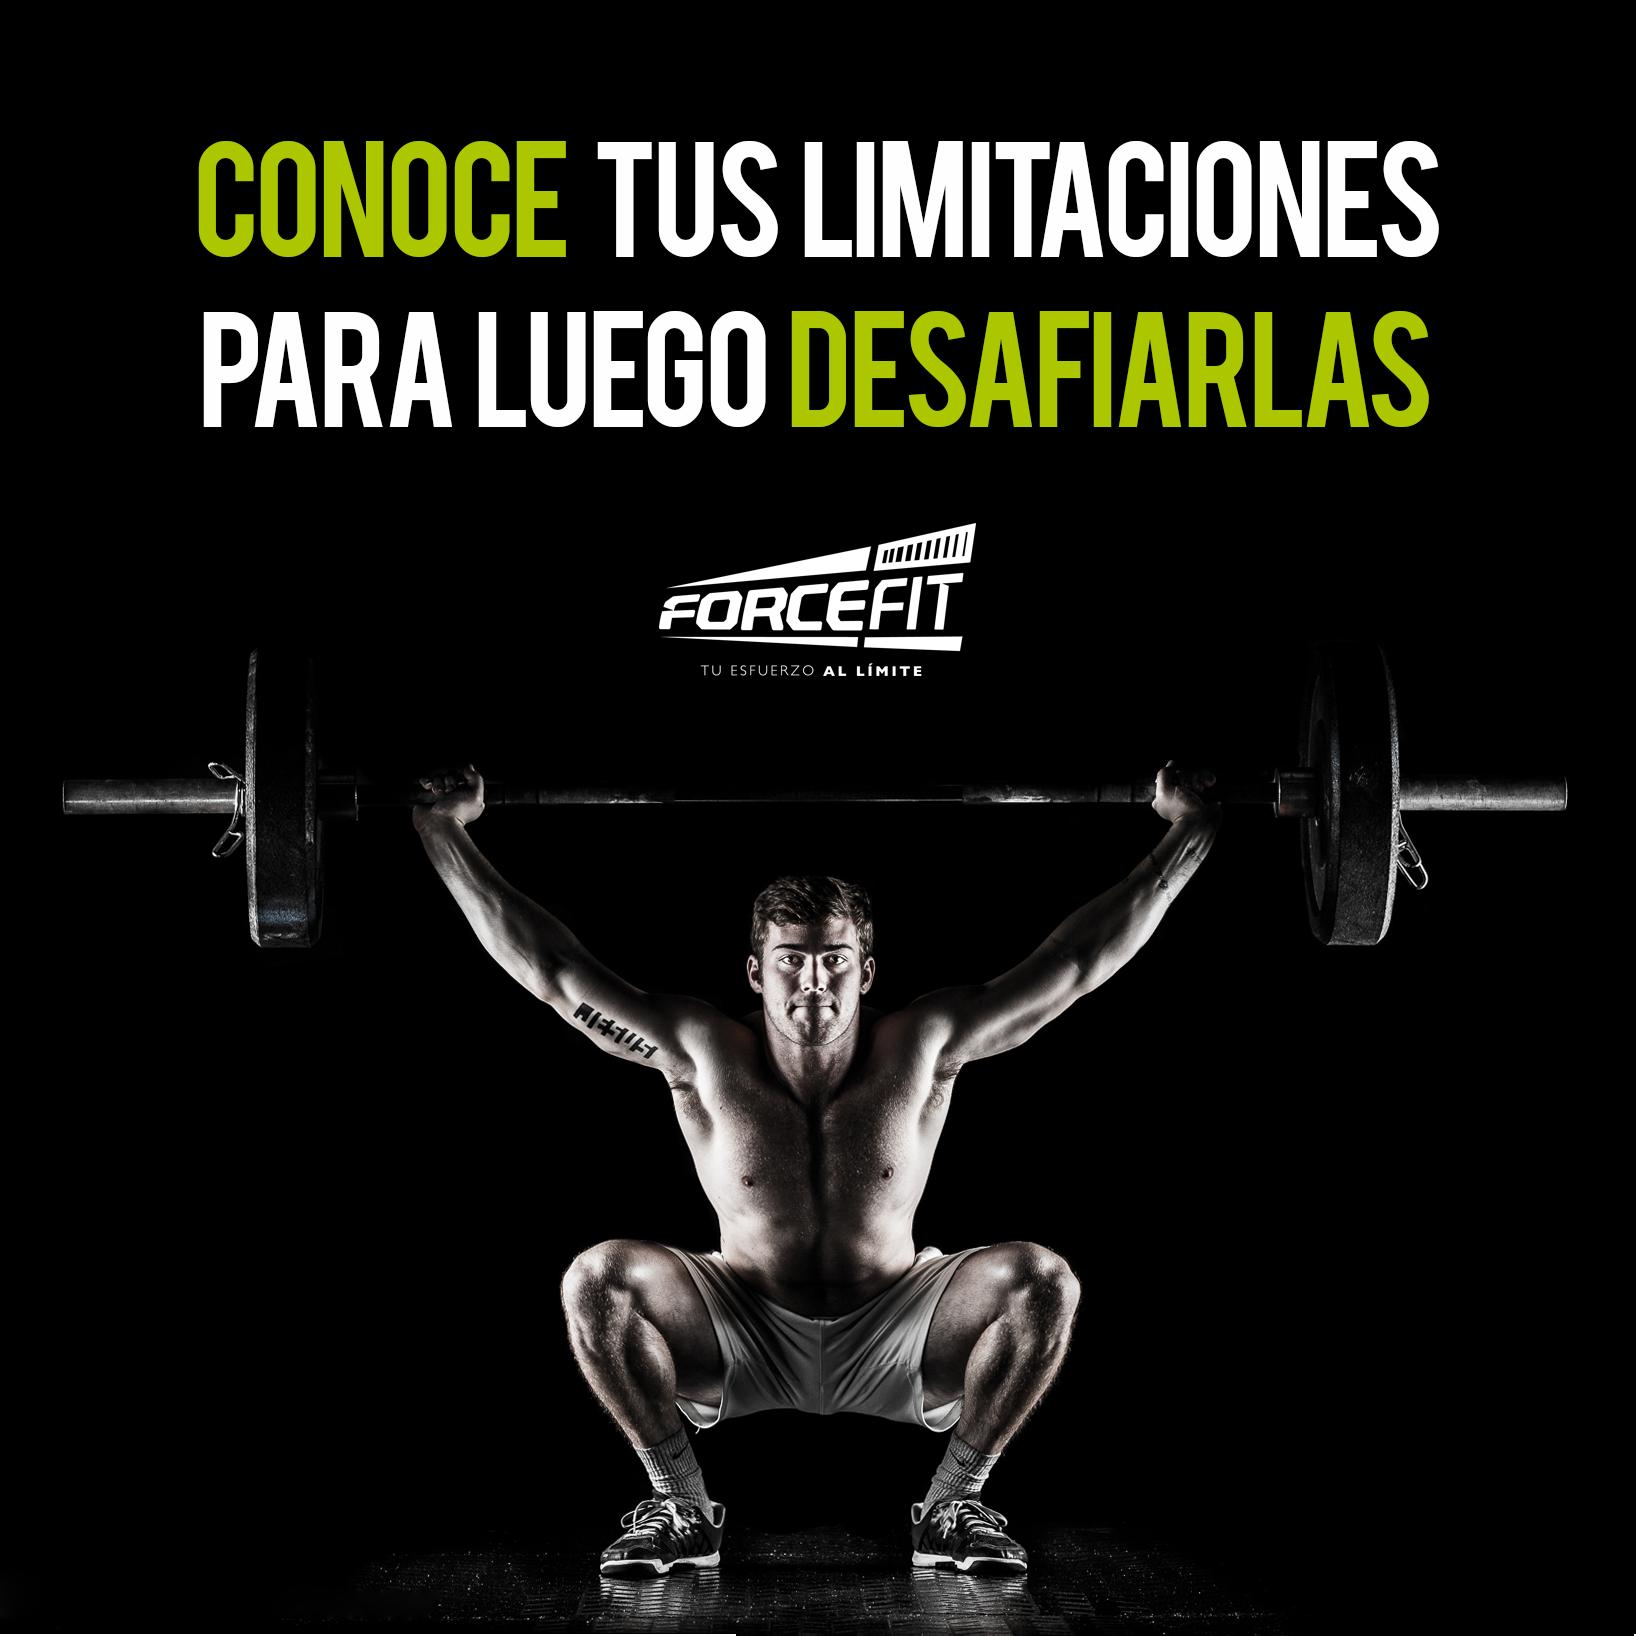 Crossfit Frases Forcefit Motivacion Conoce Tus